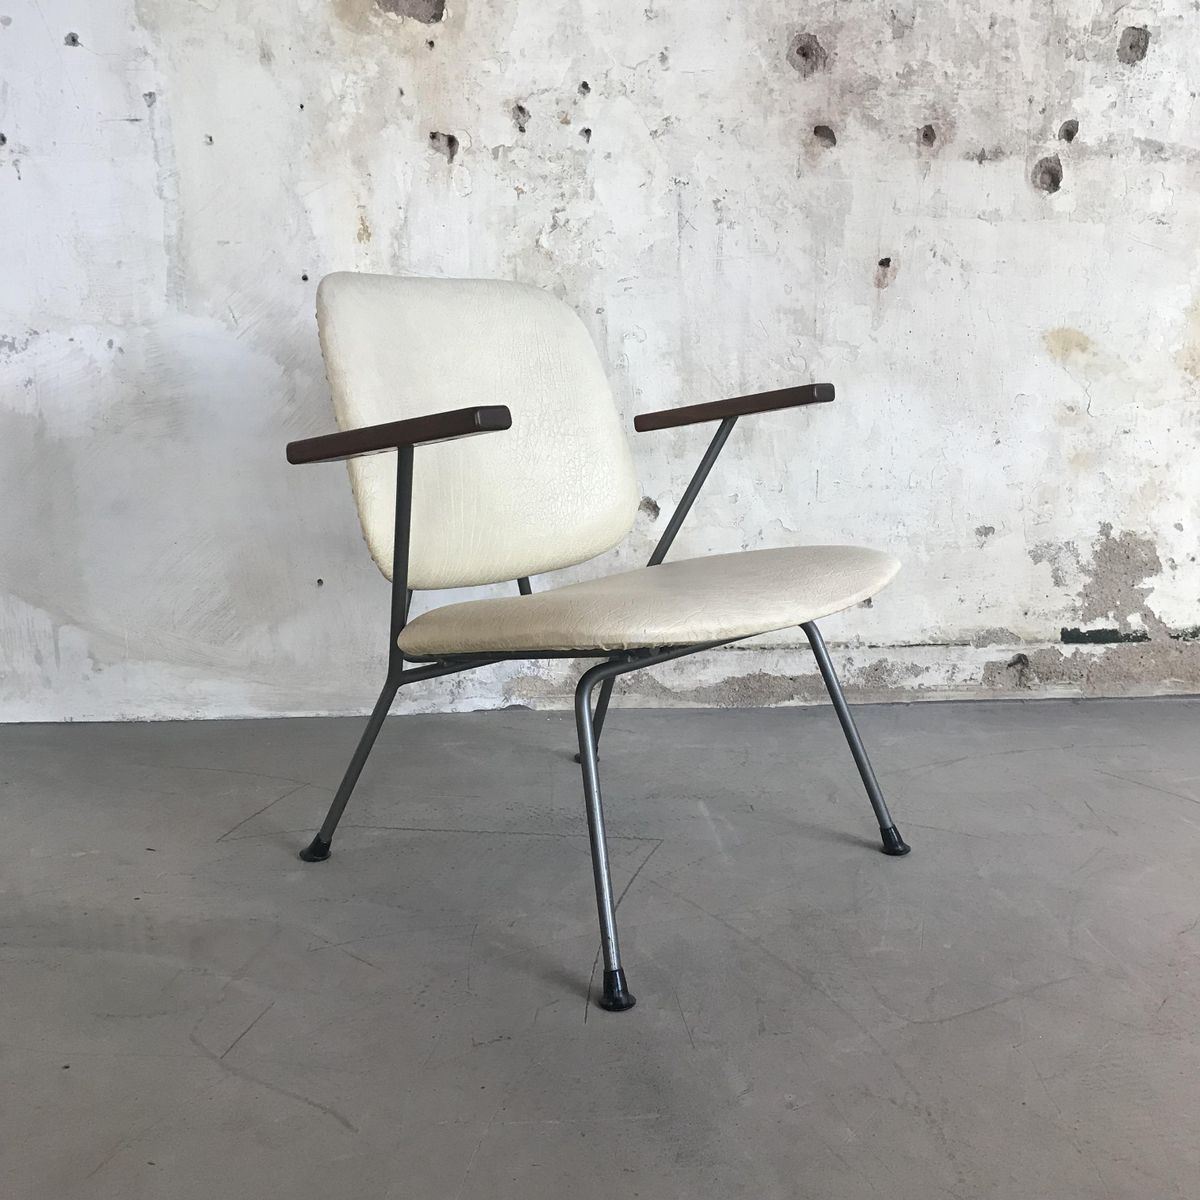 Mid century stuhl von w h gispen f r kembo 1950er aws velbert - Mid century stuhl ...